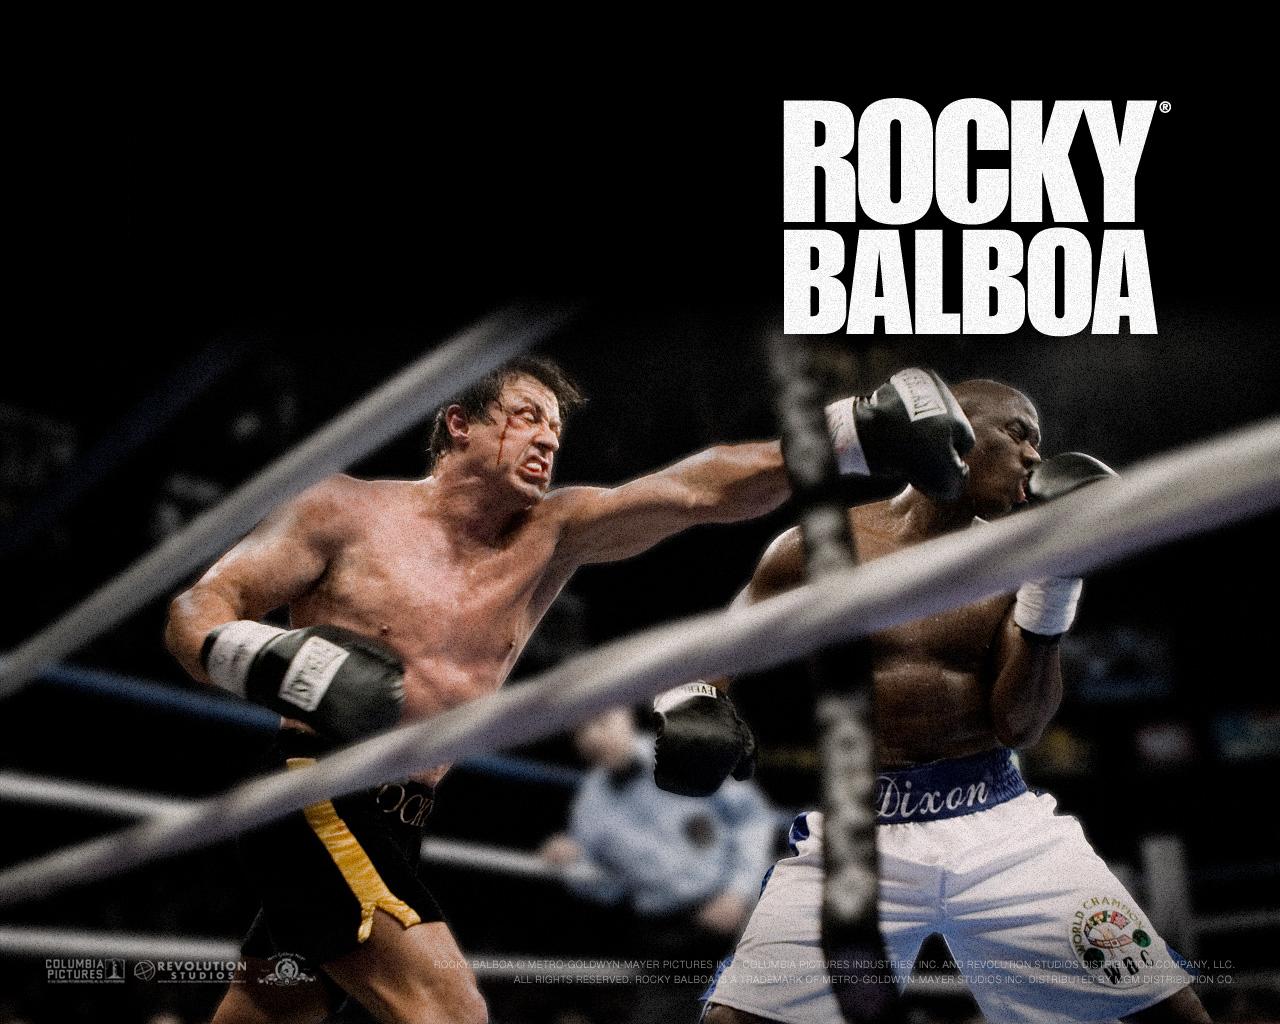 http://1.bp.blogspot.com/-baVhFm61eg8/TscFMwmgAkI/AAAAAAAAAXc/WSOL3YE4qm8/s1600/rocky-balboa-wallpaper-hd-2-743720.jpg